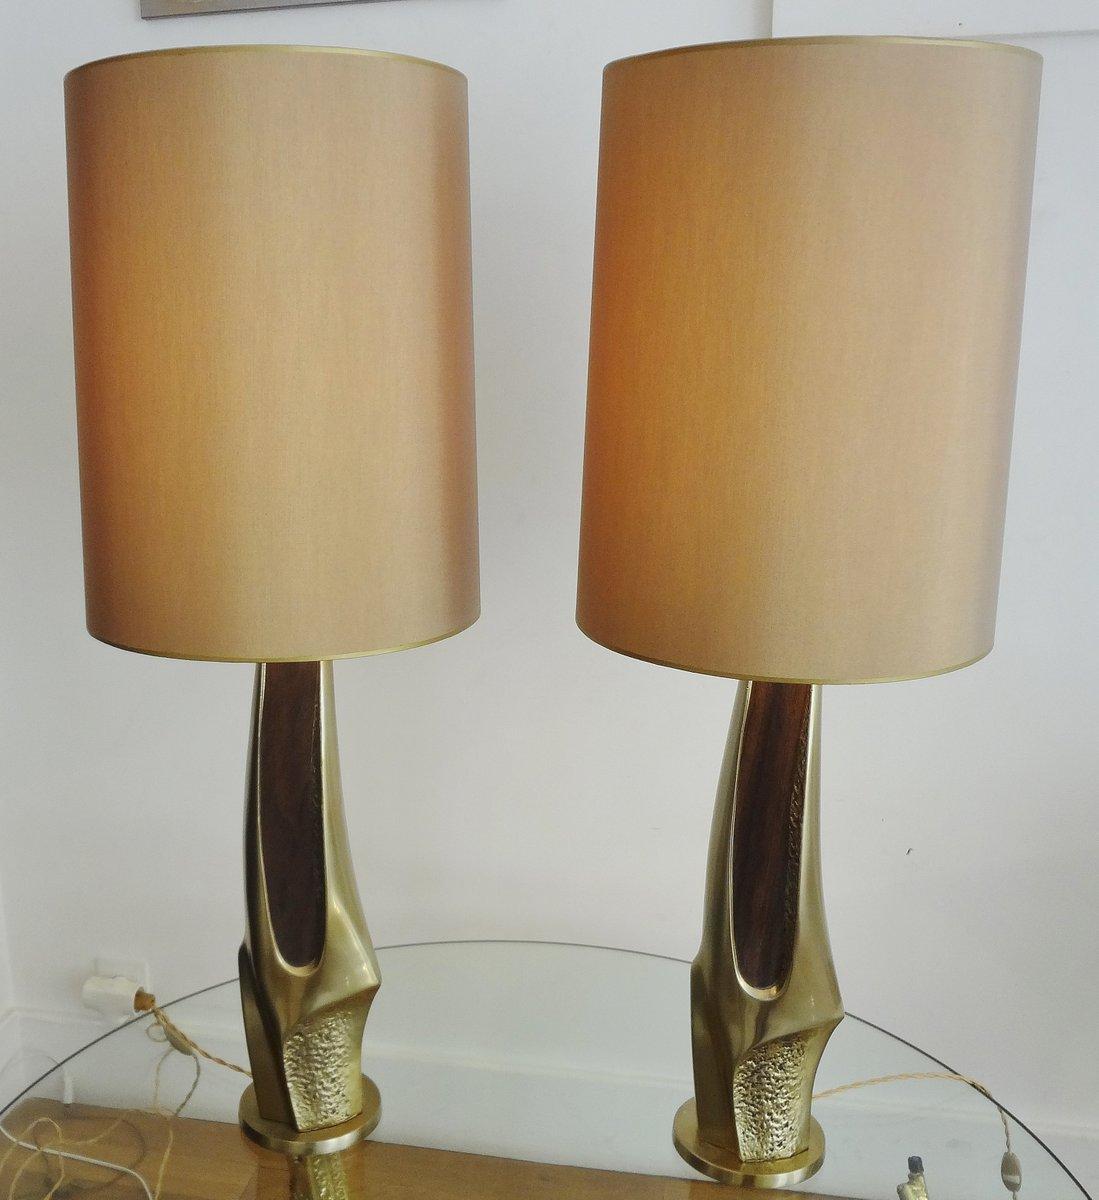 Geschnitzte Lampen aus vergoldetem Messing von Laurel & Company, 1970e...